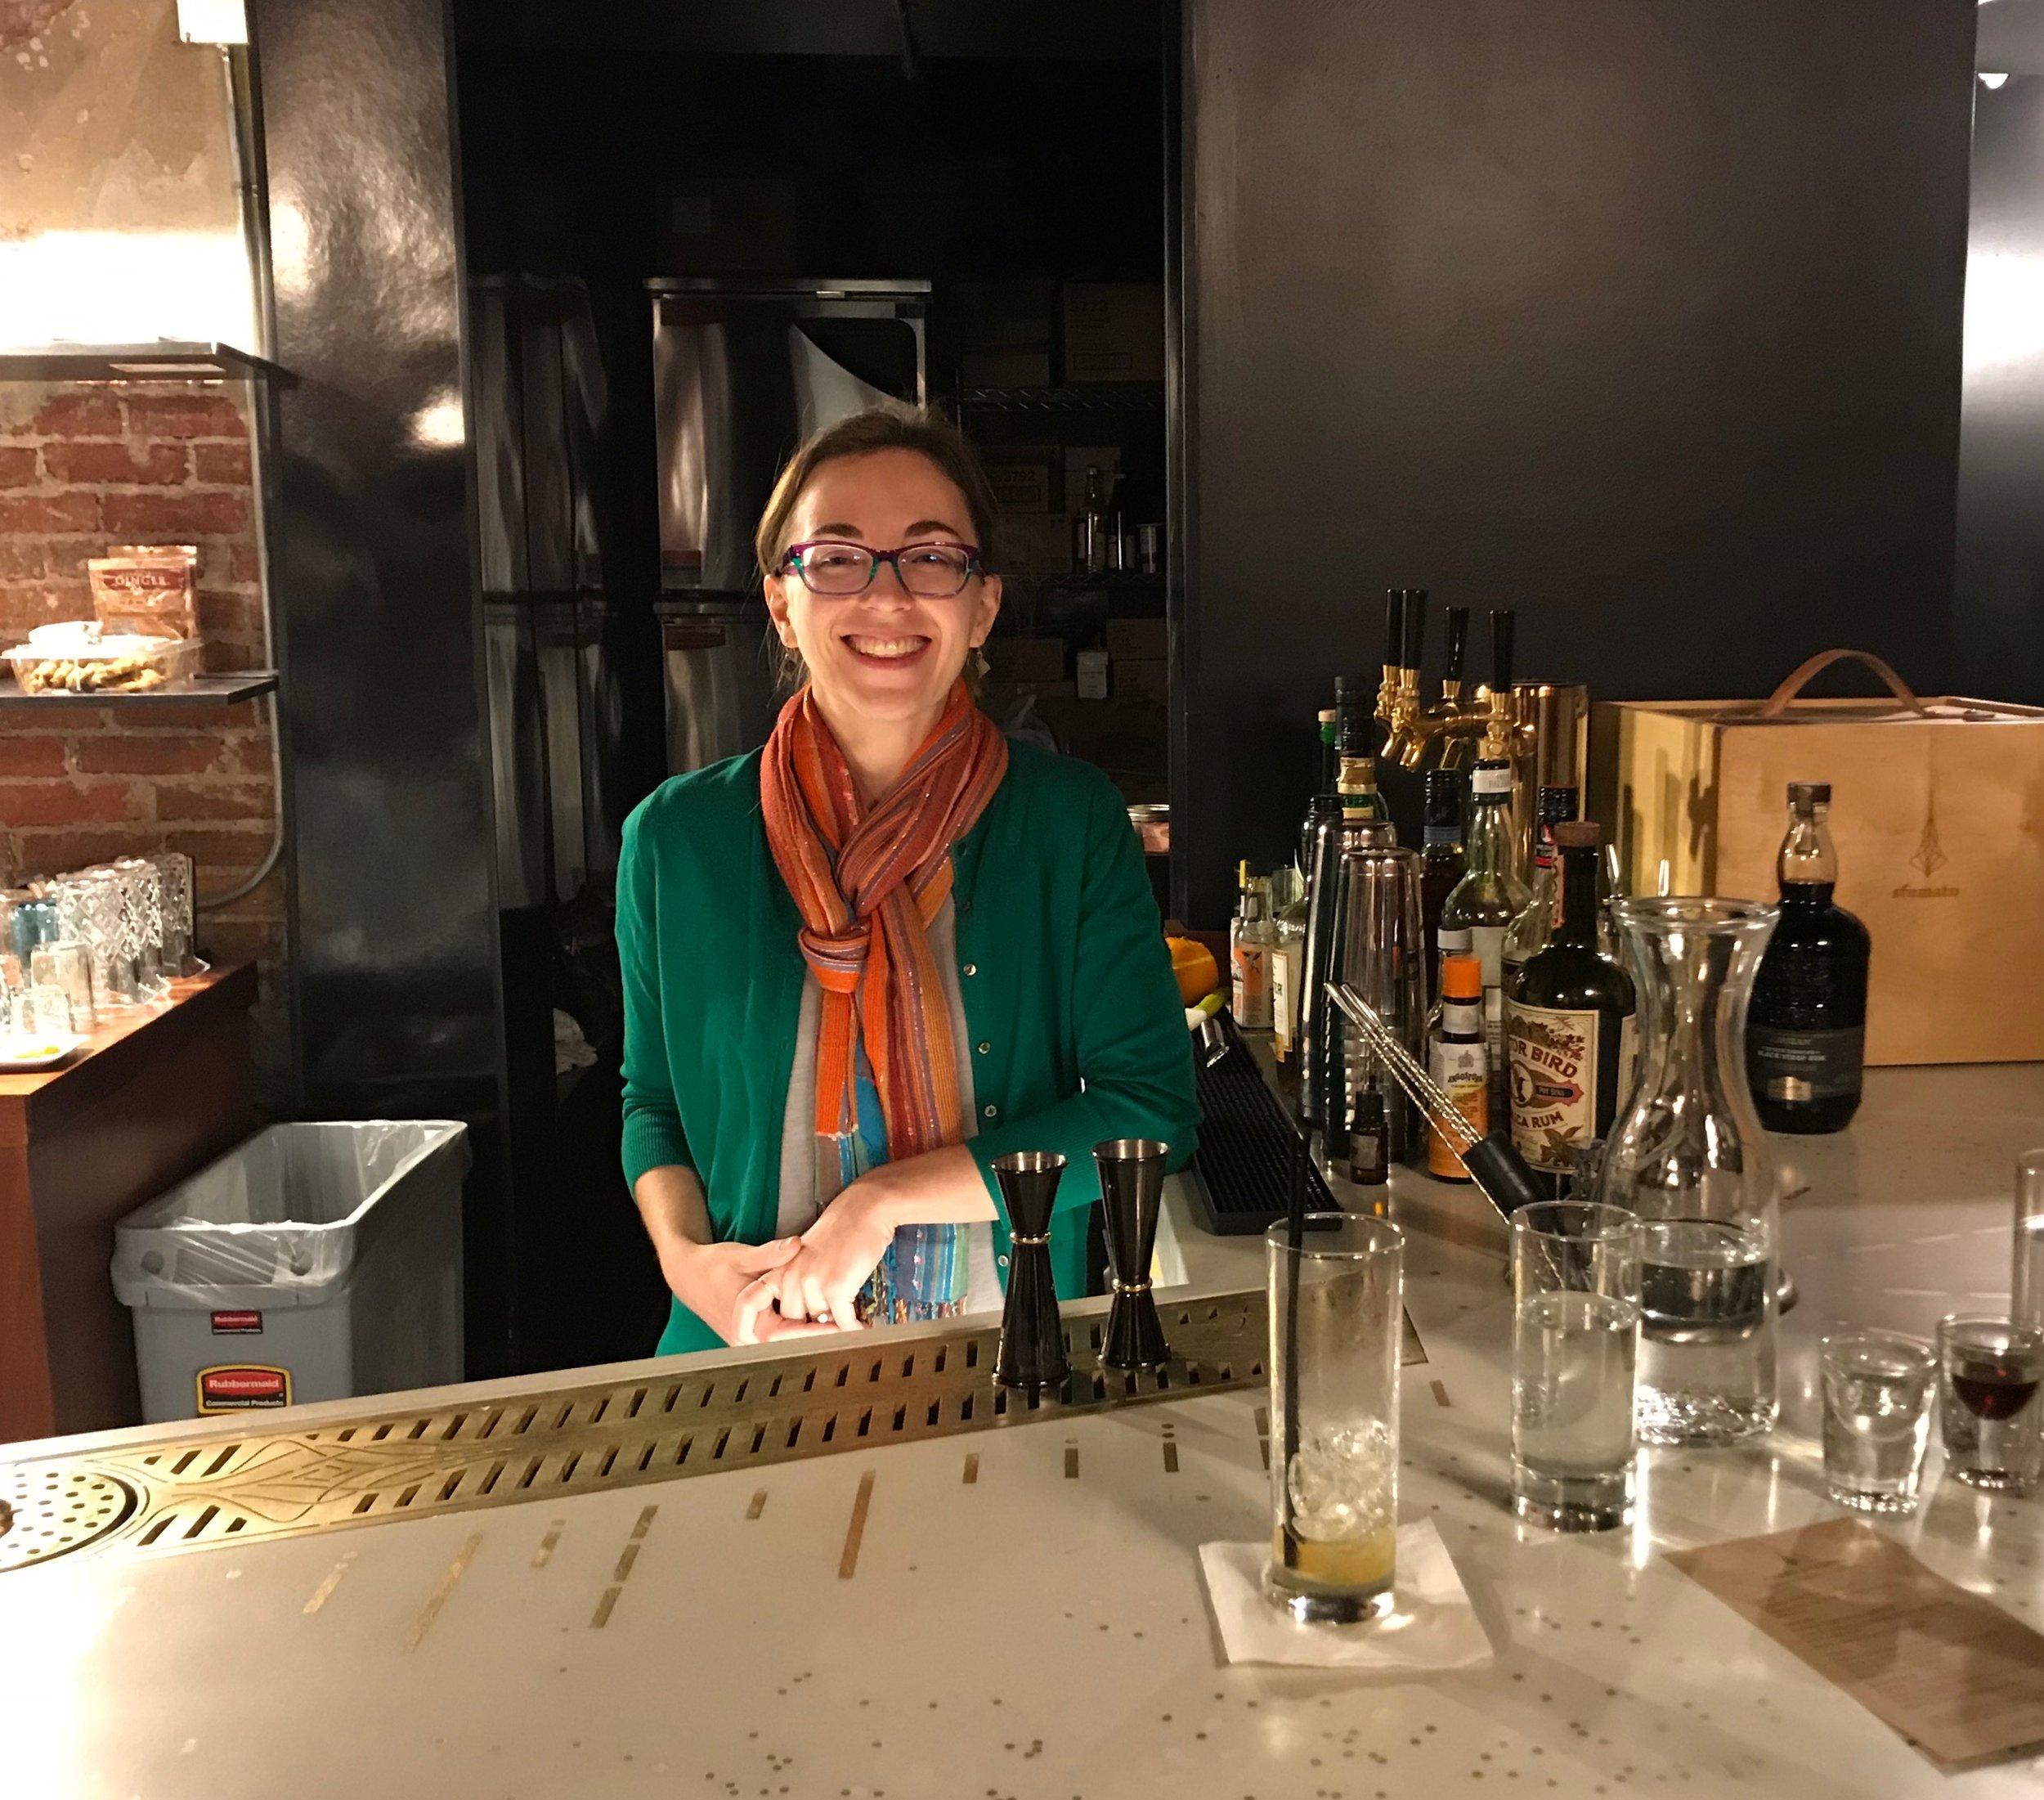 Entrepreneur Jane Larson of Sfumato Fragrances & Castalia Scented Cocktail Bar in Detroit, Michigan